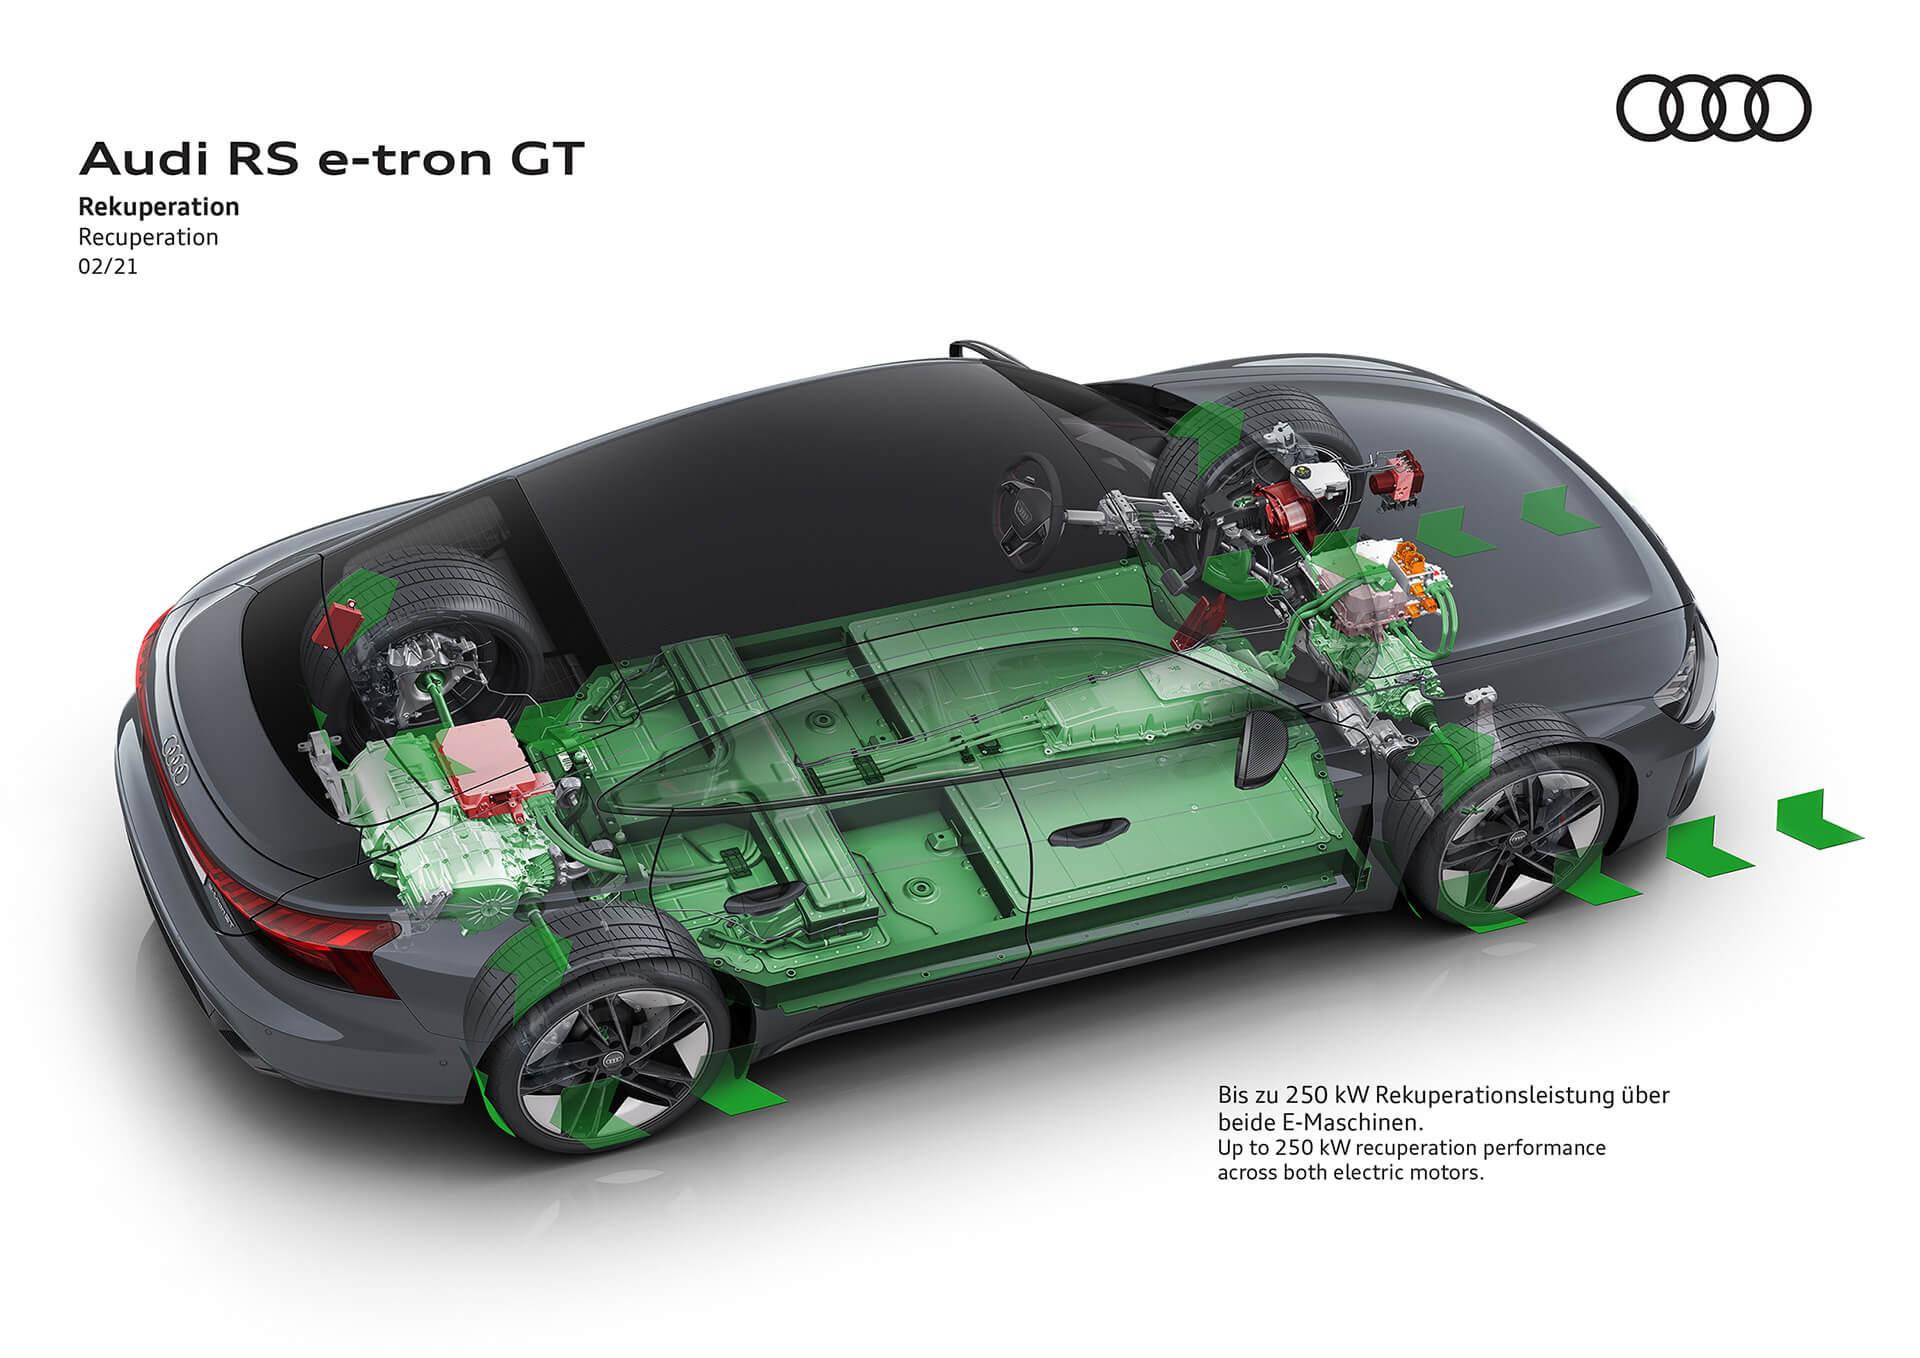 Audi RS e-tron GT - Ανάκτηση ενέργειας